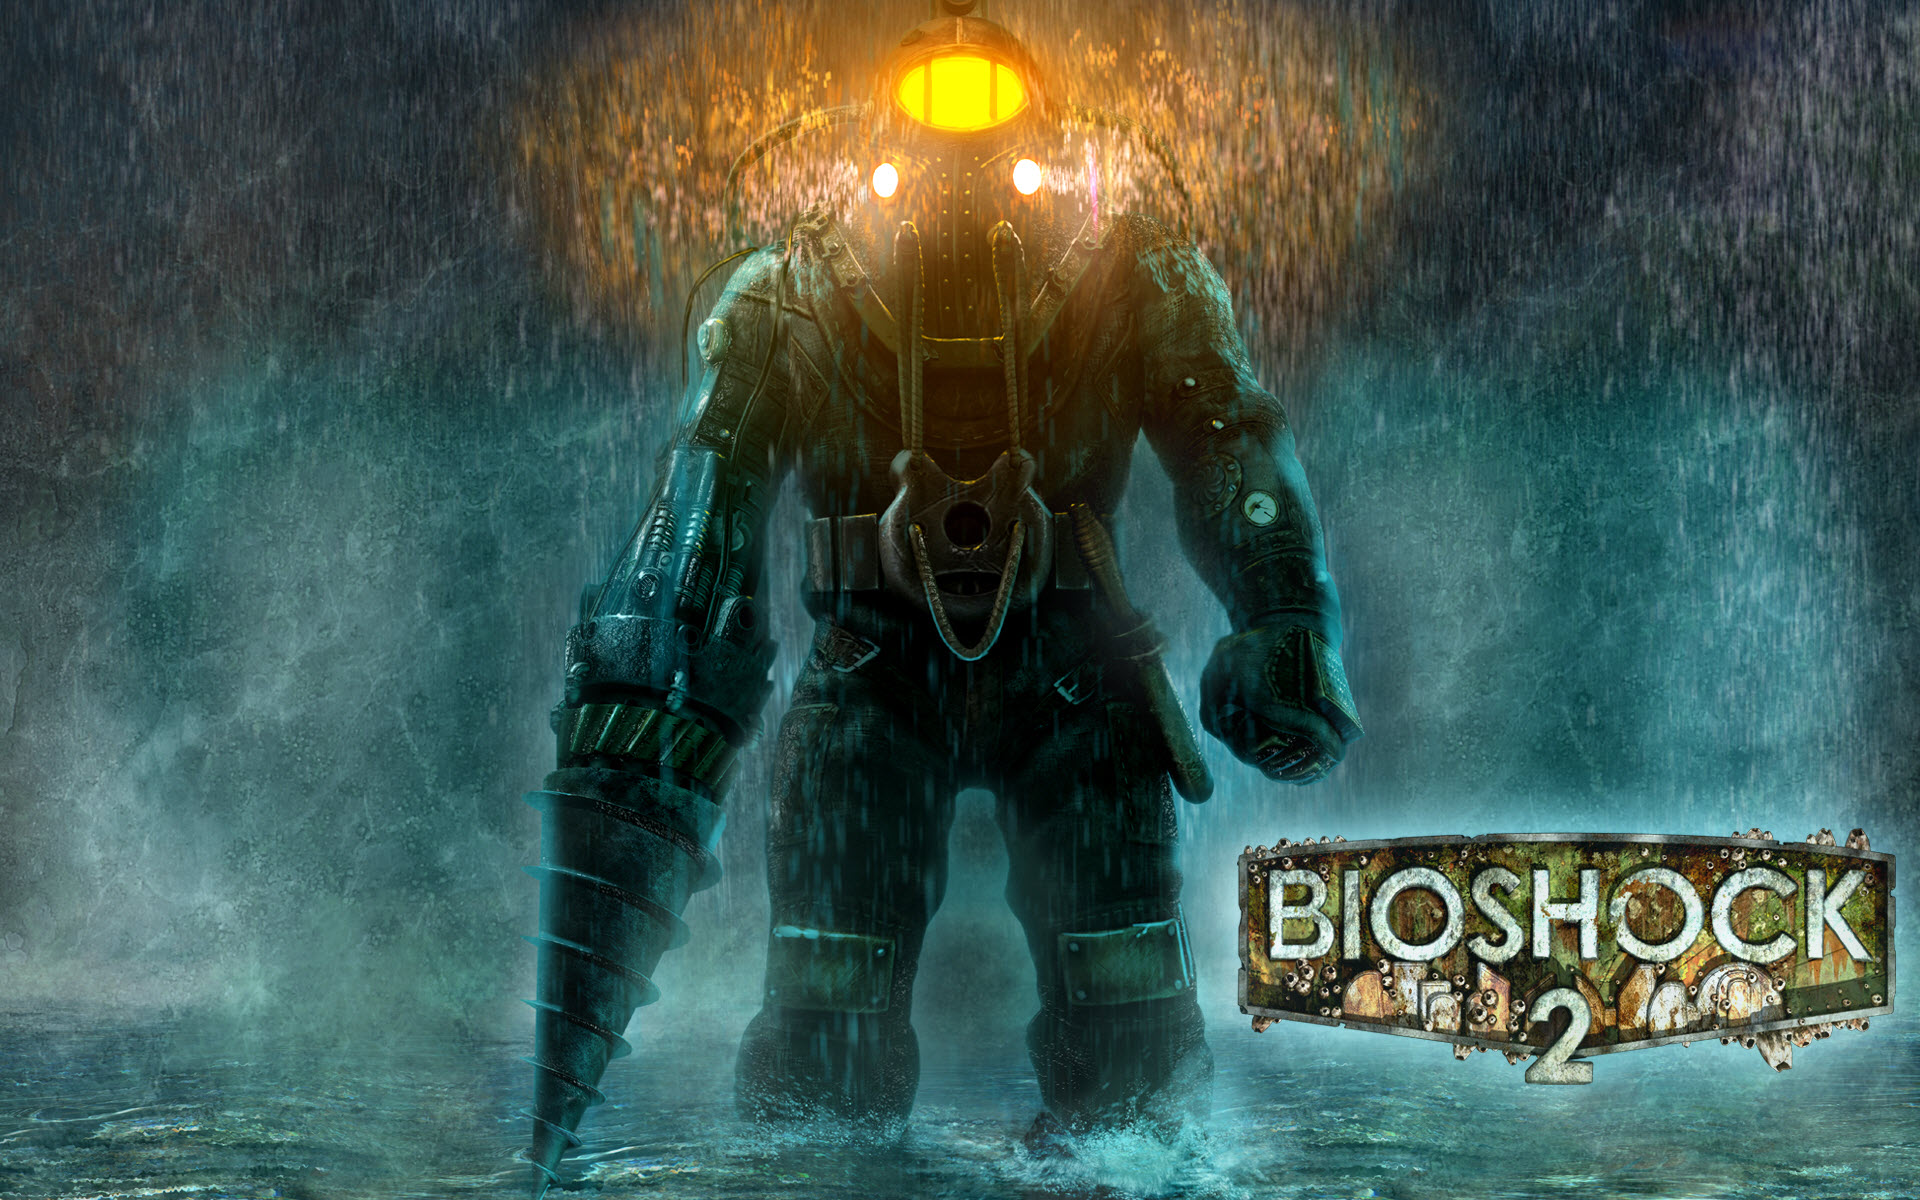 Bioshock hd